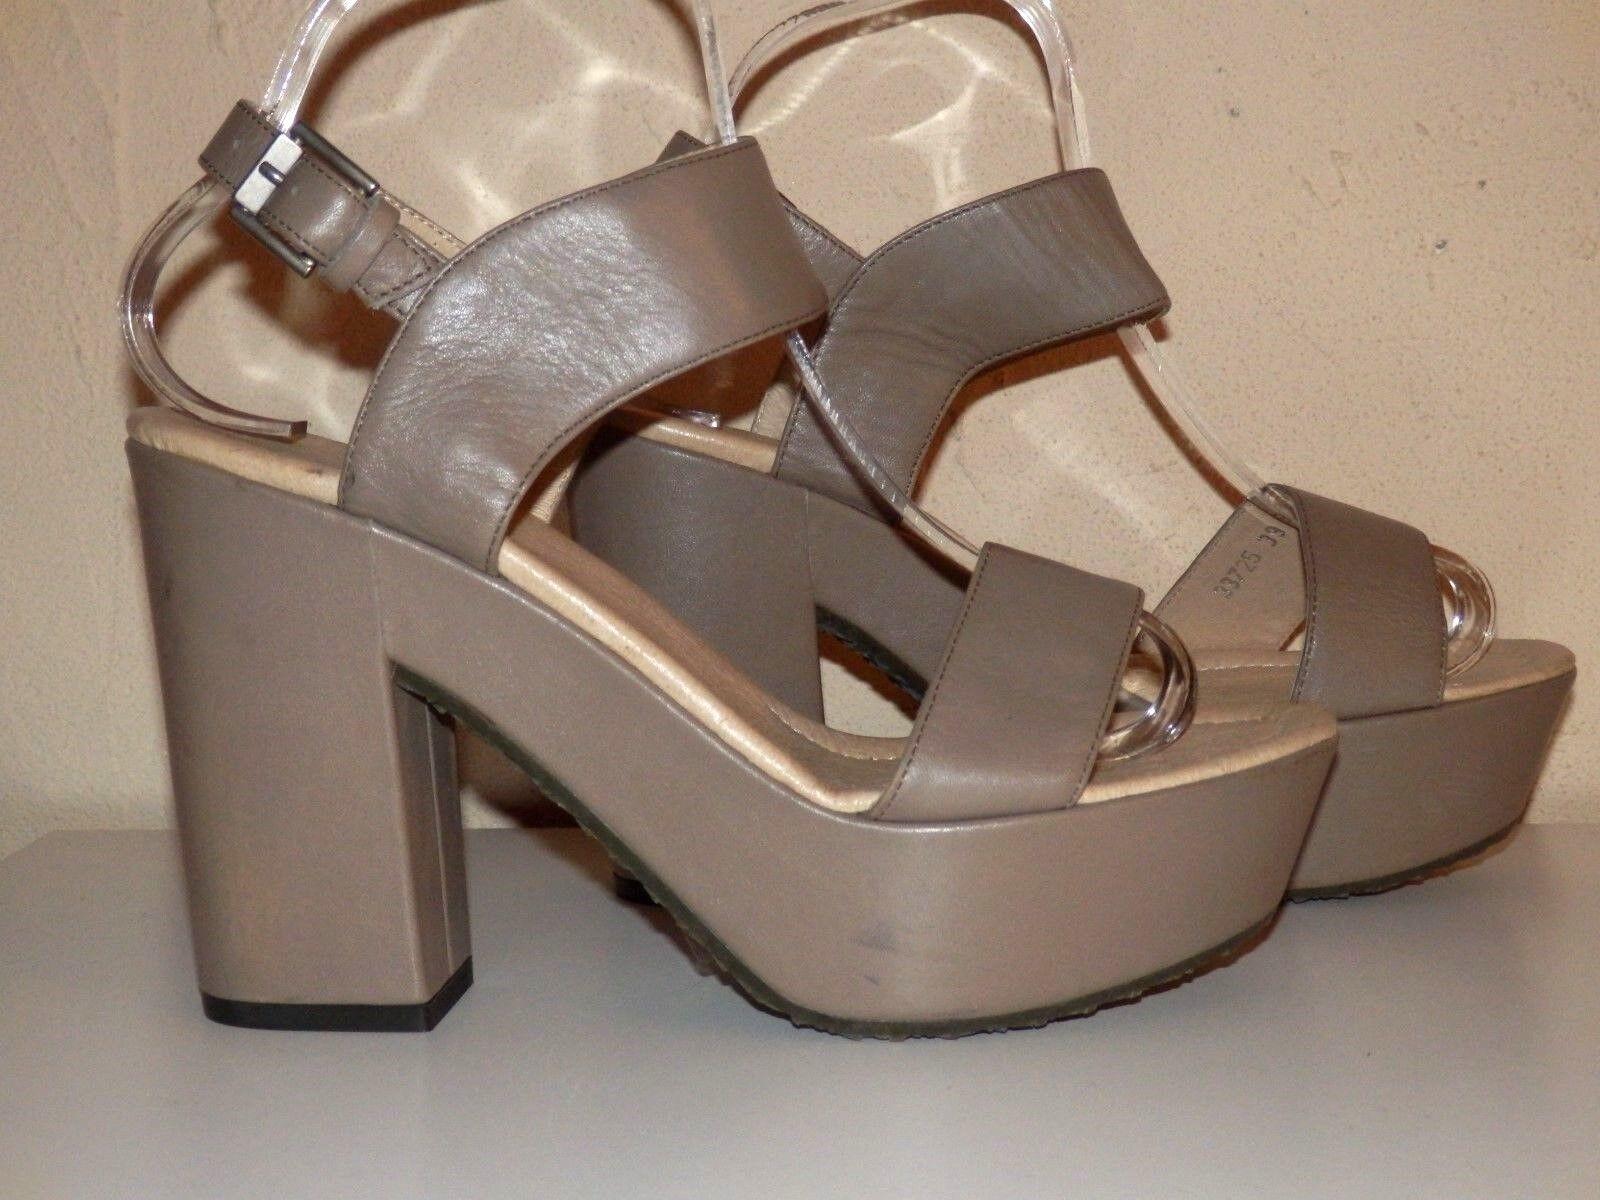 JANET SPORT - Sandale - Schuhe - t.39 - fast neu - genuine